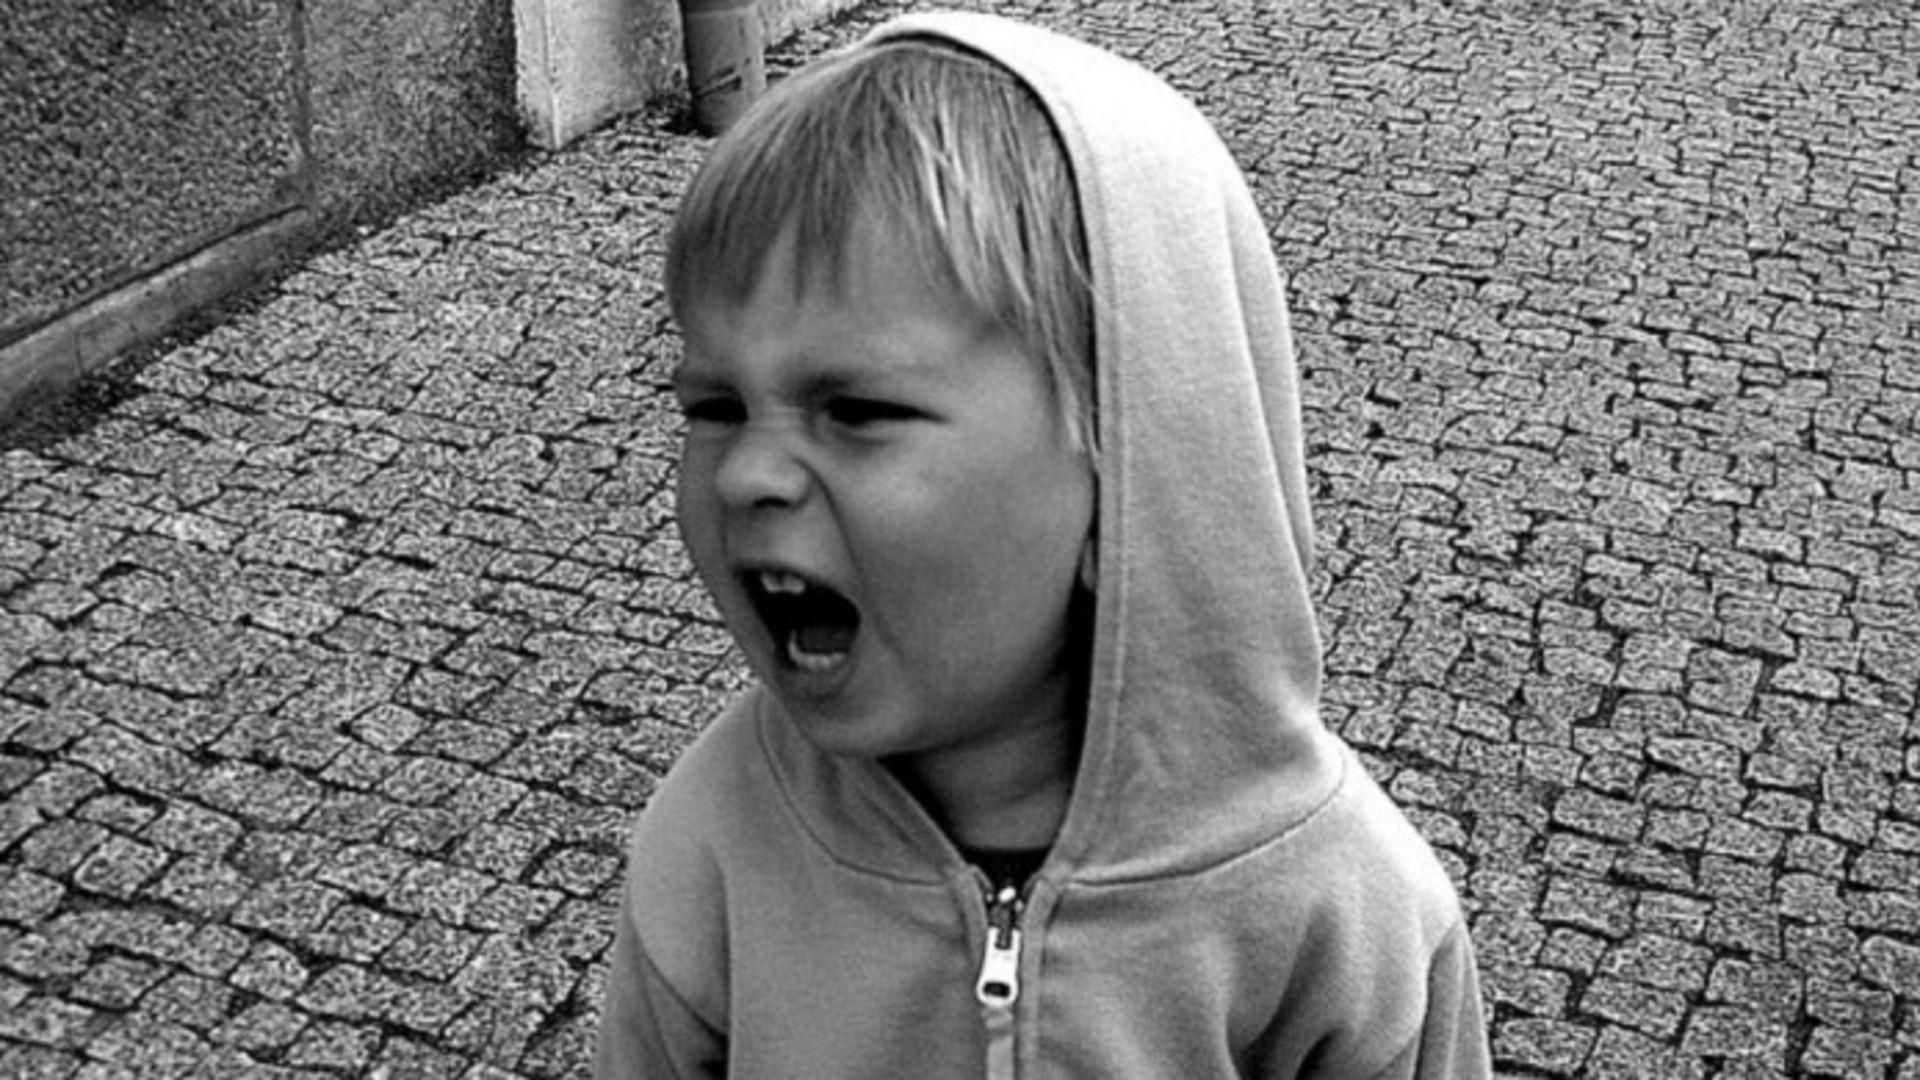 Narsist çocuk sendromu